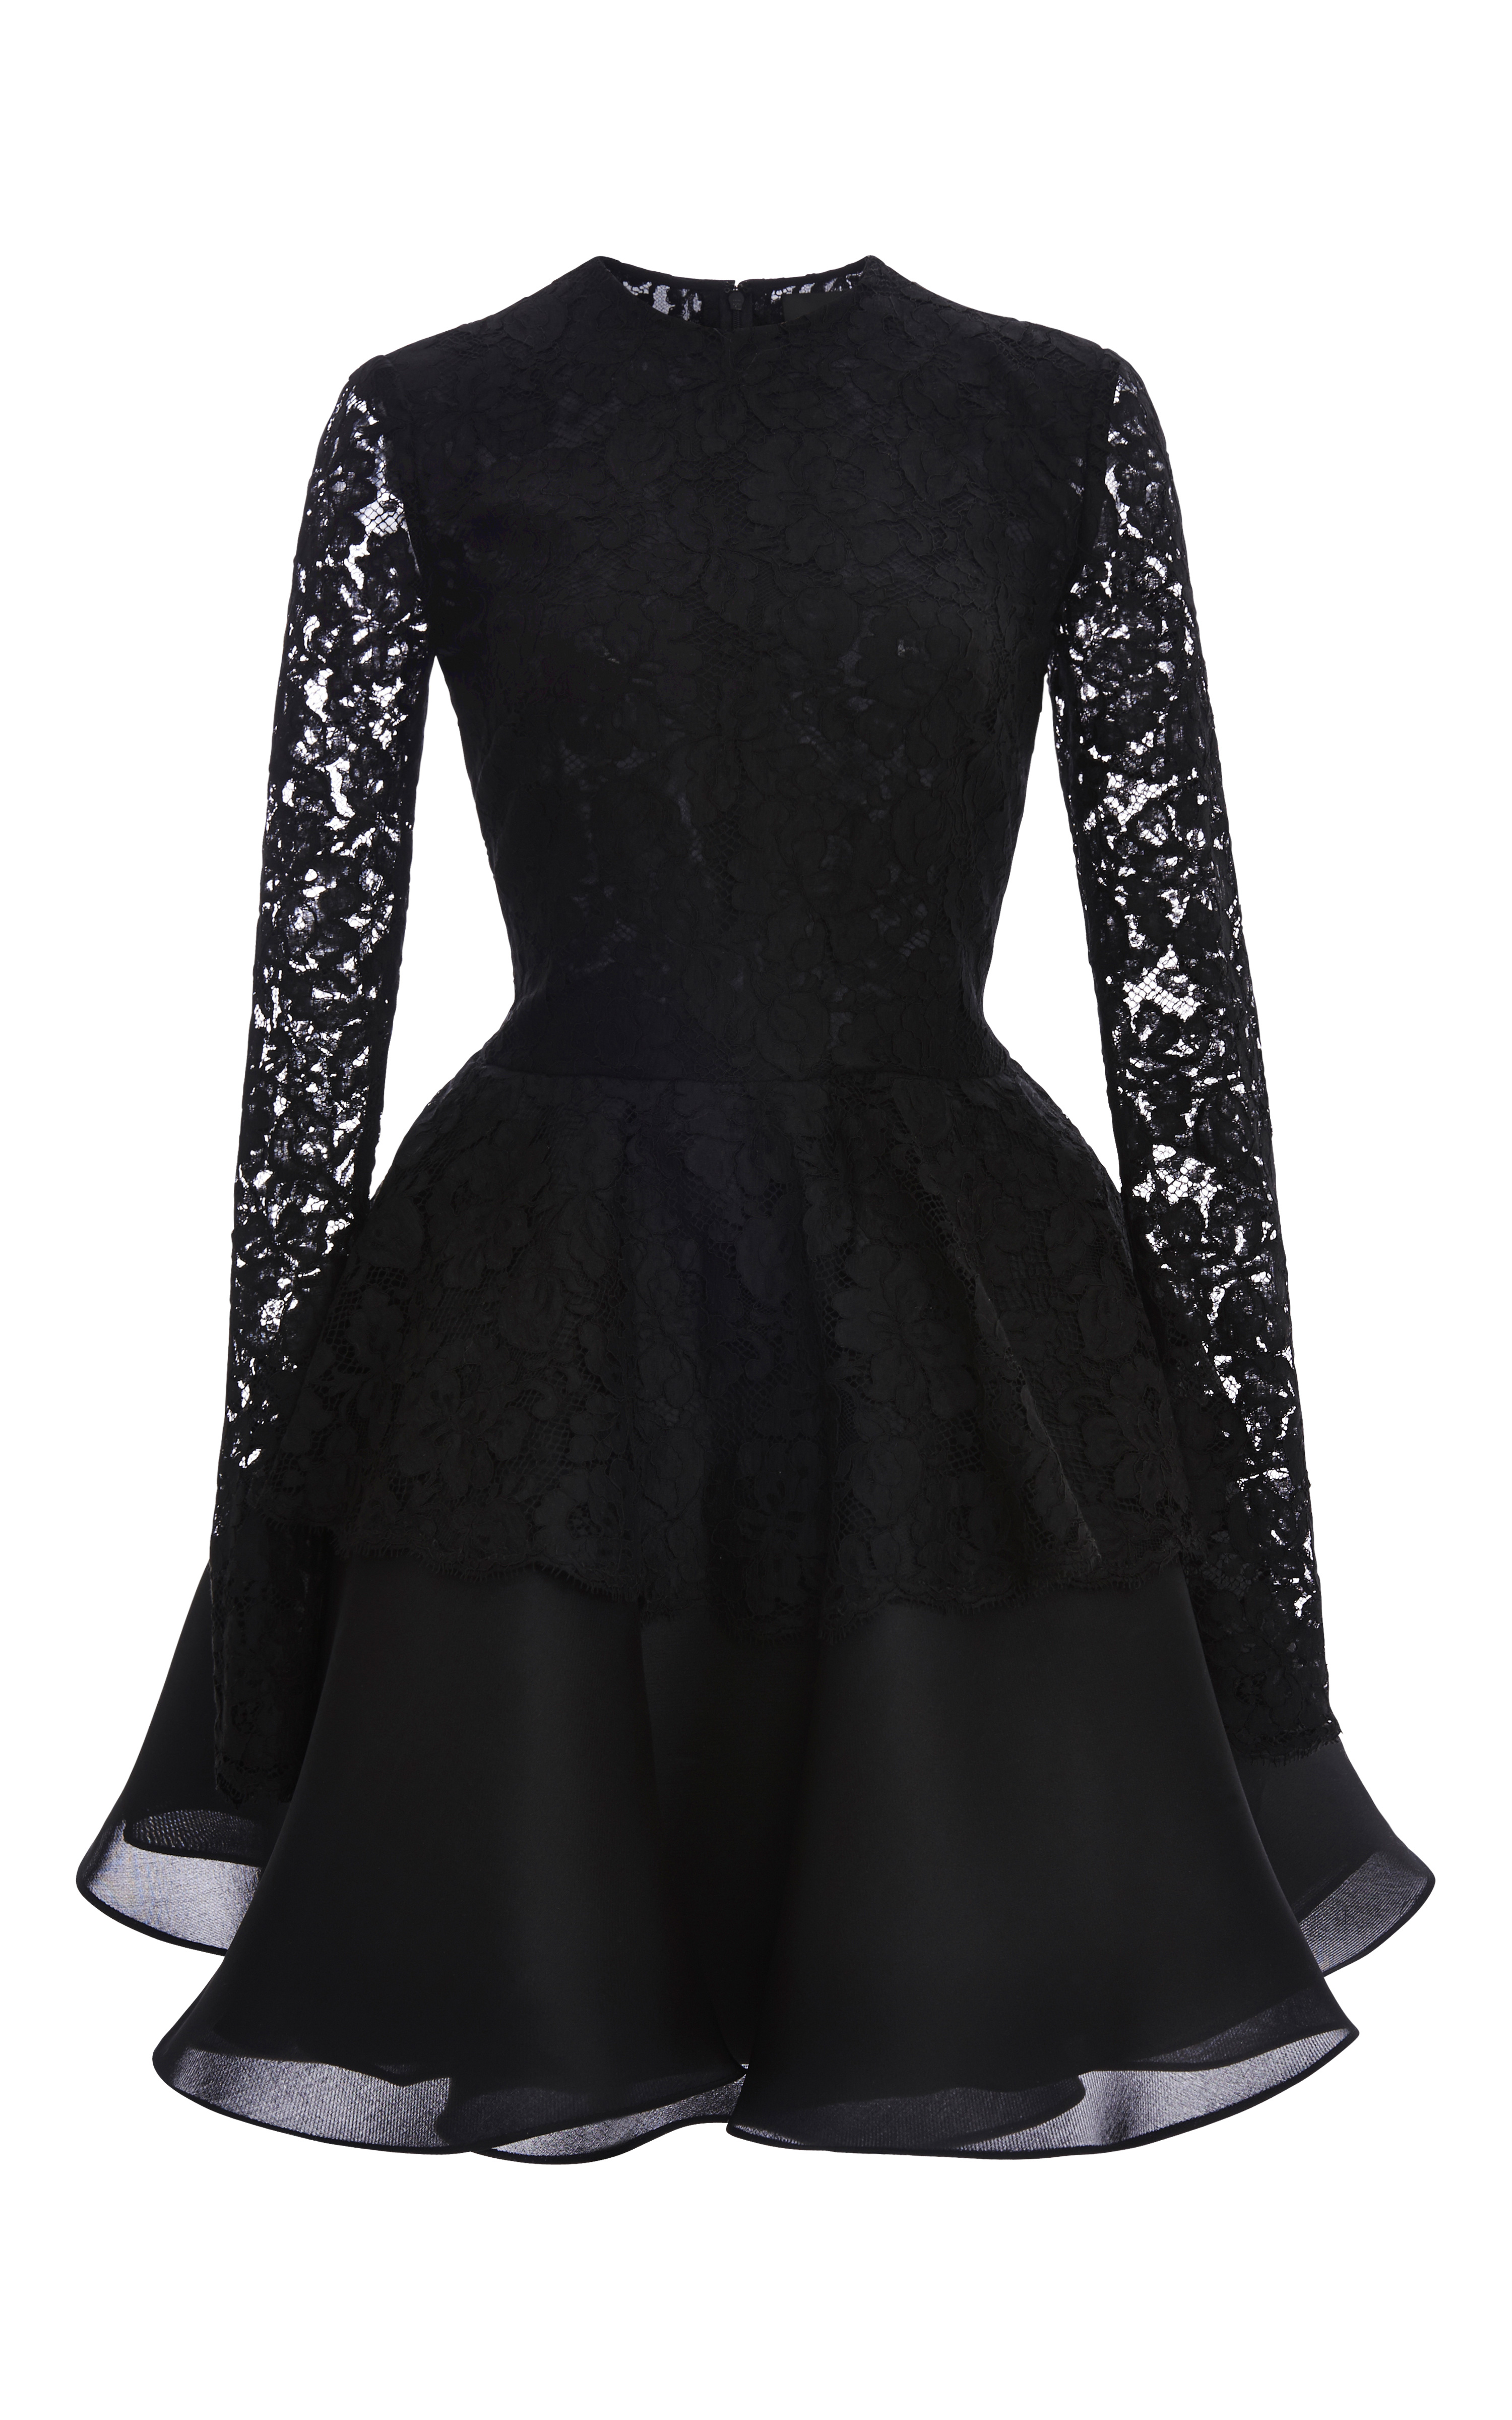 0236c8e335d8 Cushnie et Ochs Lace with Silk Gazaar Dress in Black - Lyst